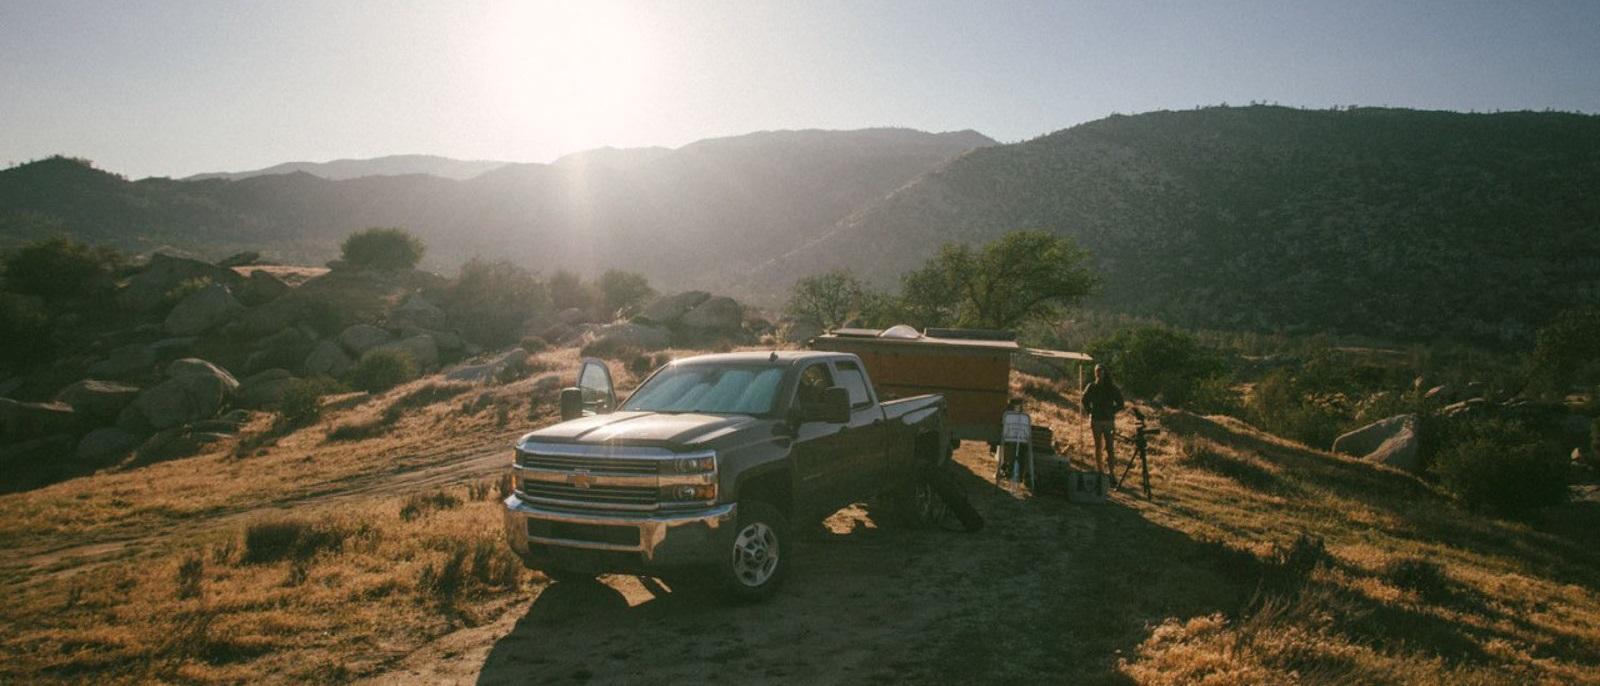 2015 Chevy Silverado 2500HD hauling a load